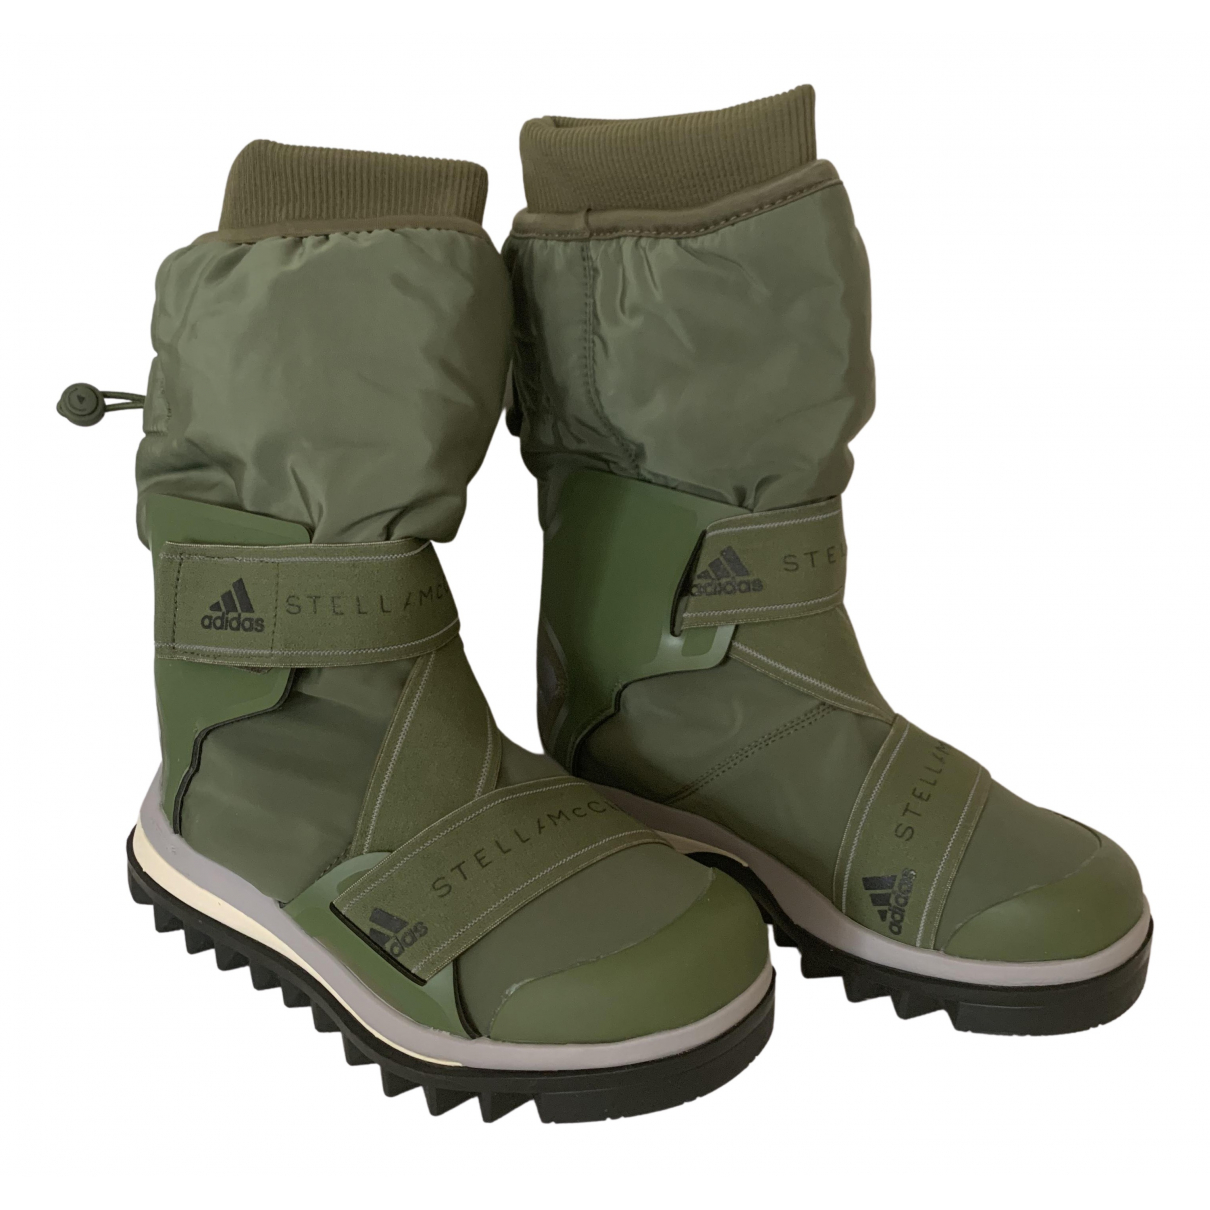 Stella Mccartney Pour Adidas N Khaki Boots for Women 36 EU